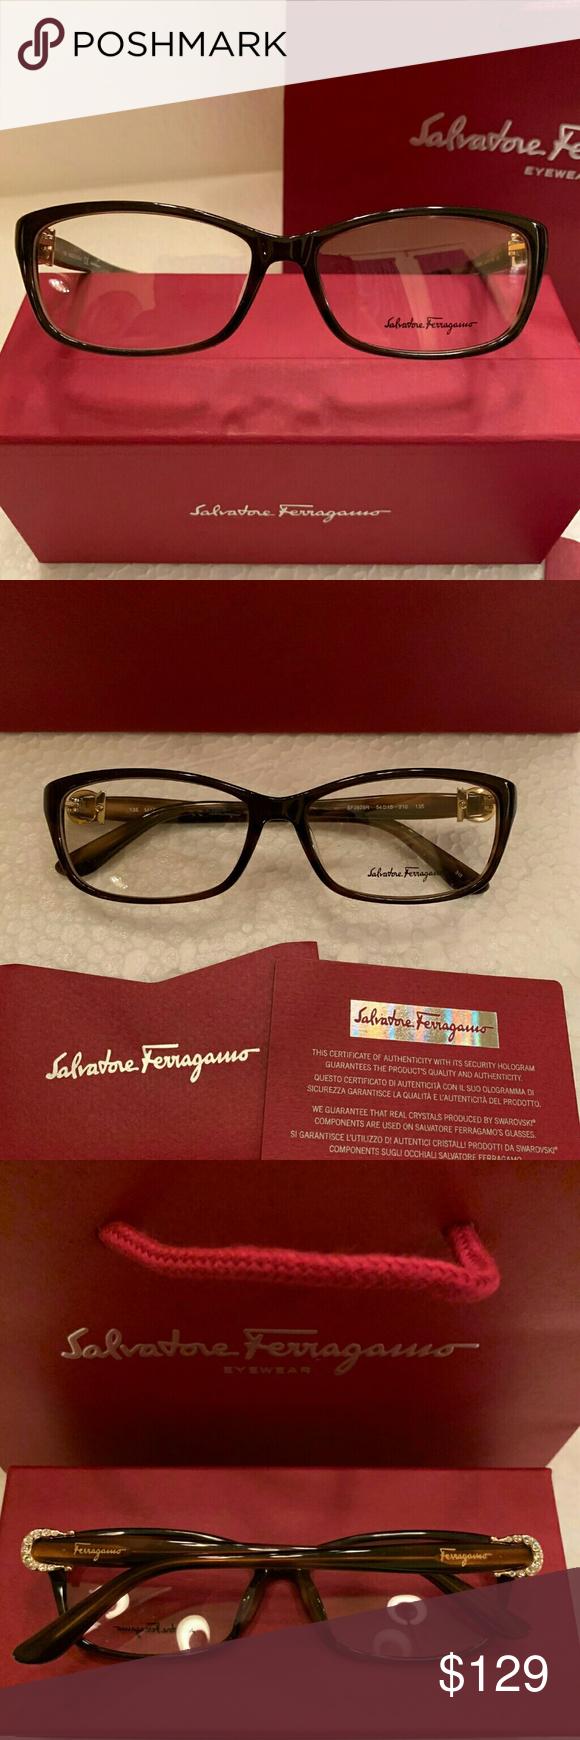 4436cecf825 Salvatore Ferragamo Eyeglasses Frame Style SF2629R Salvatore Ferragamo  Eyeglasses Frame SF2629R Rich Tortoise Frame   Gold